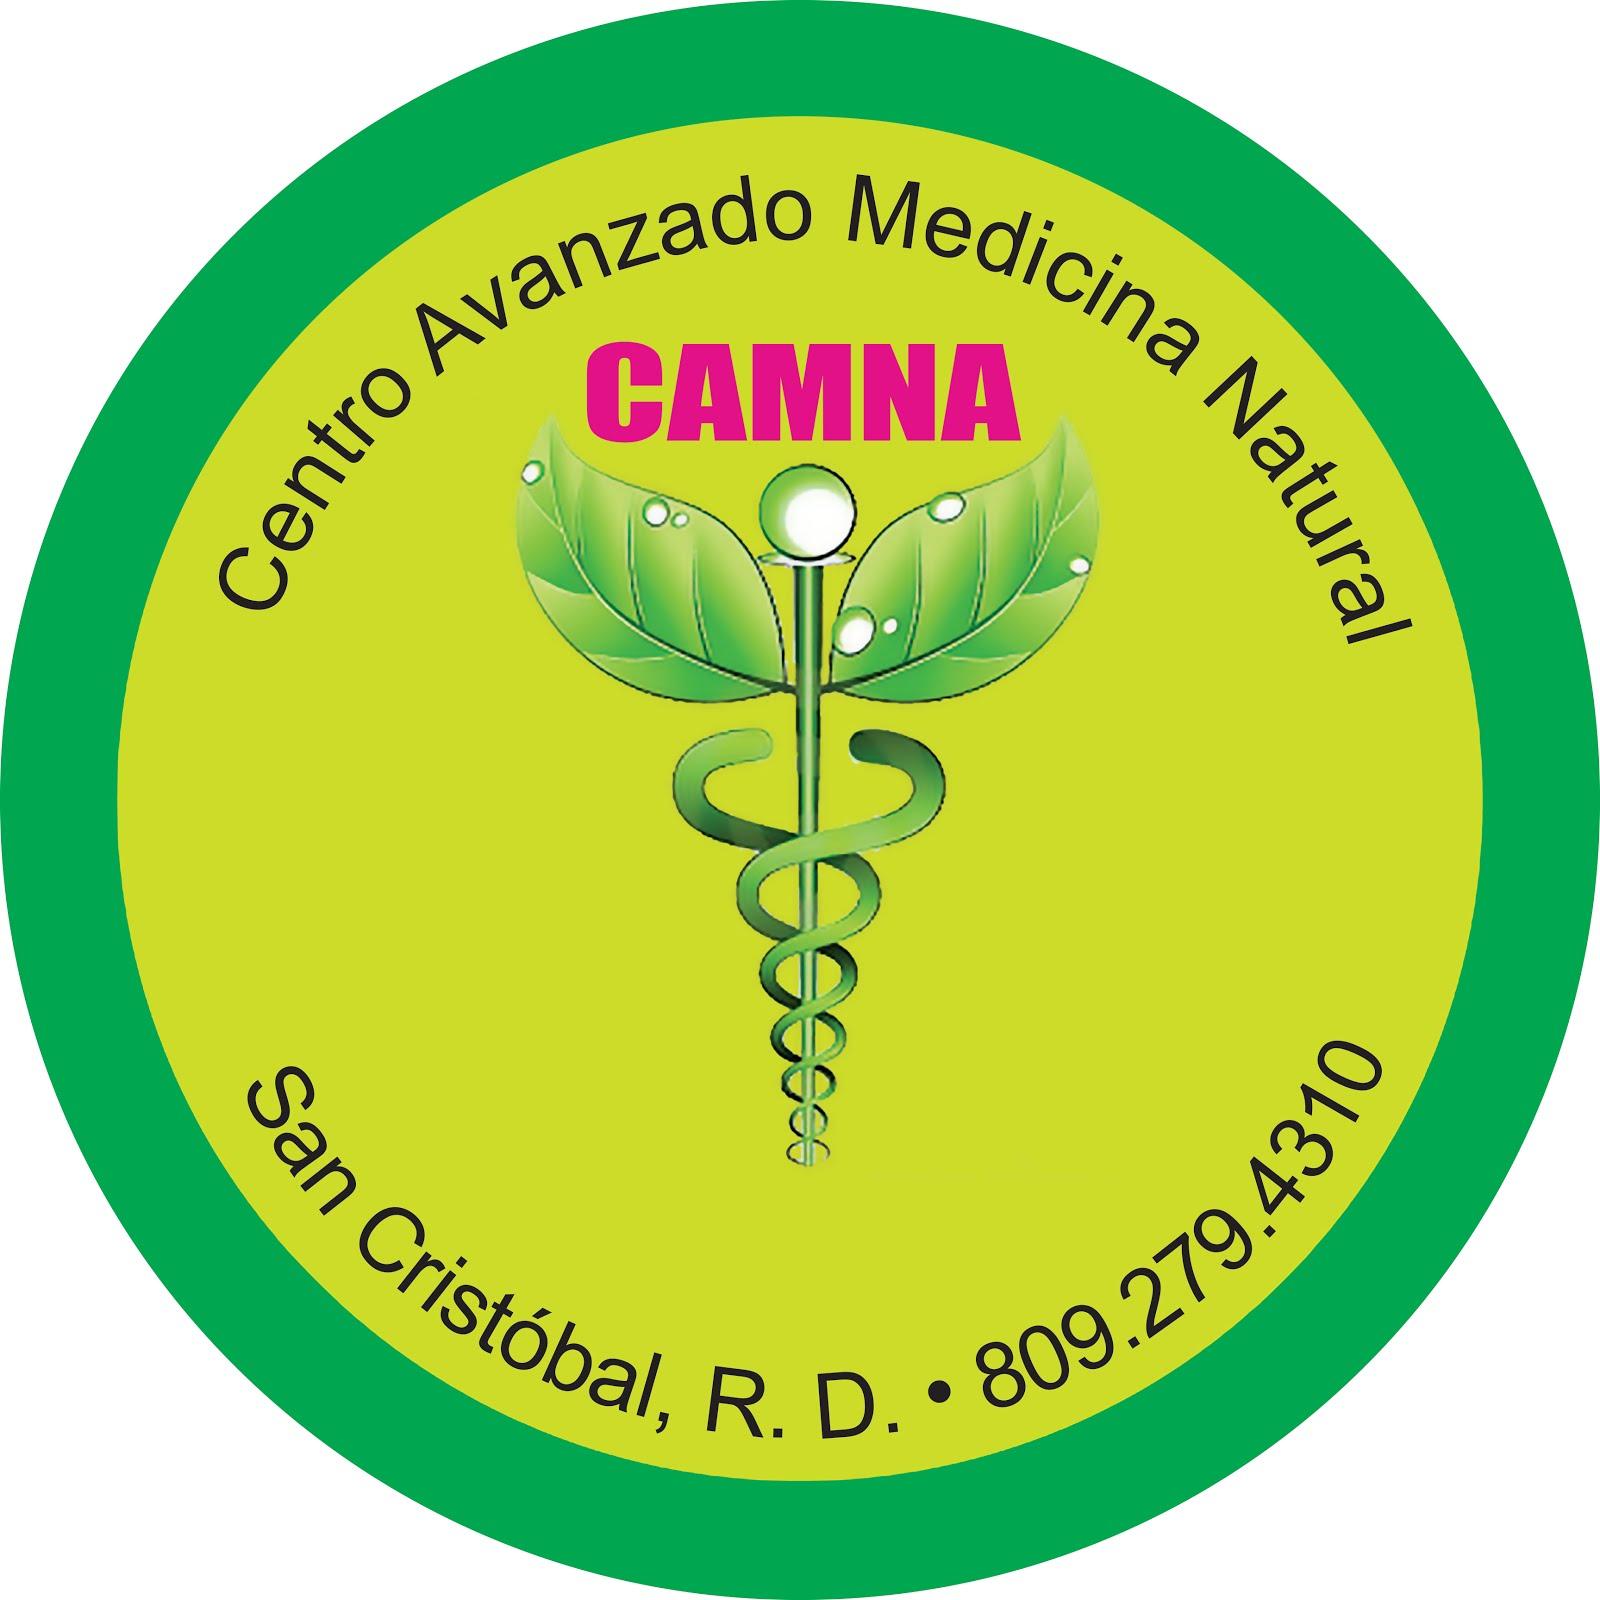 MEDICINA 100%NATURAL 809-527-4306